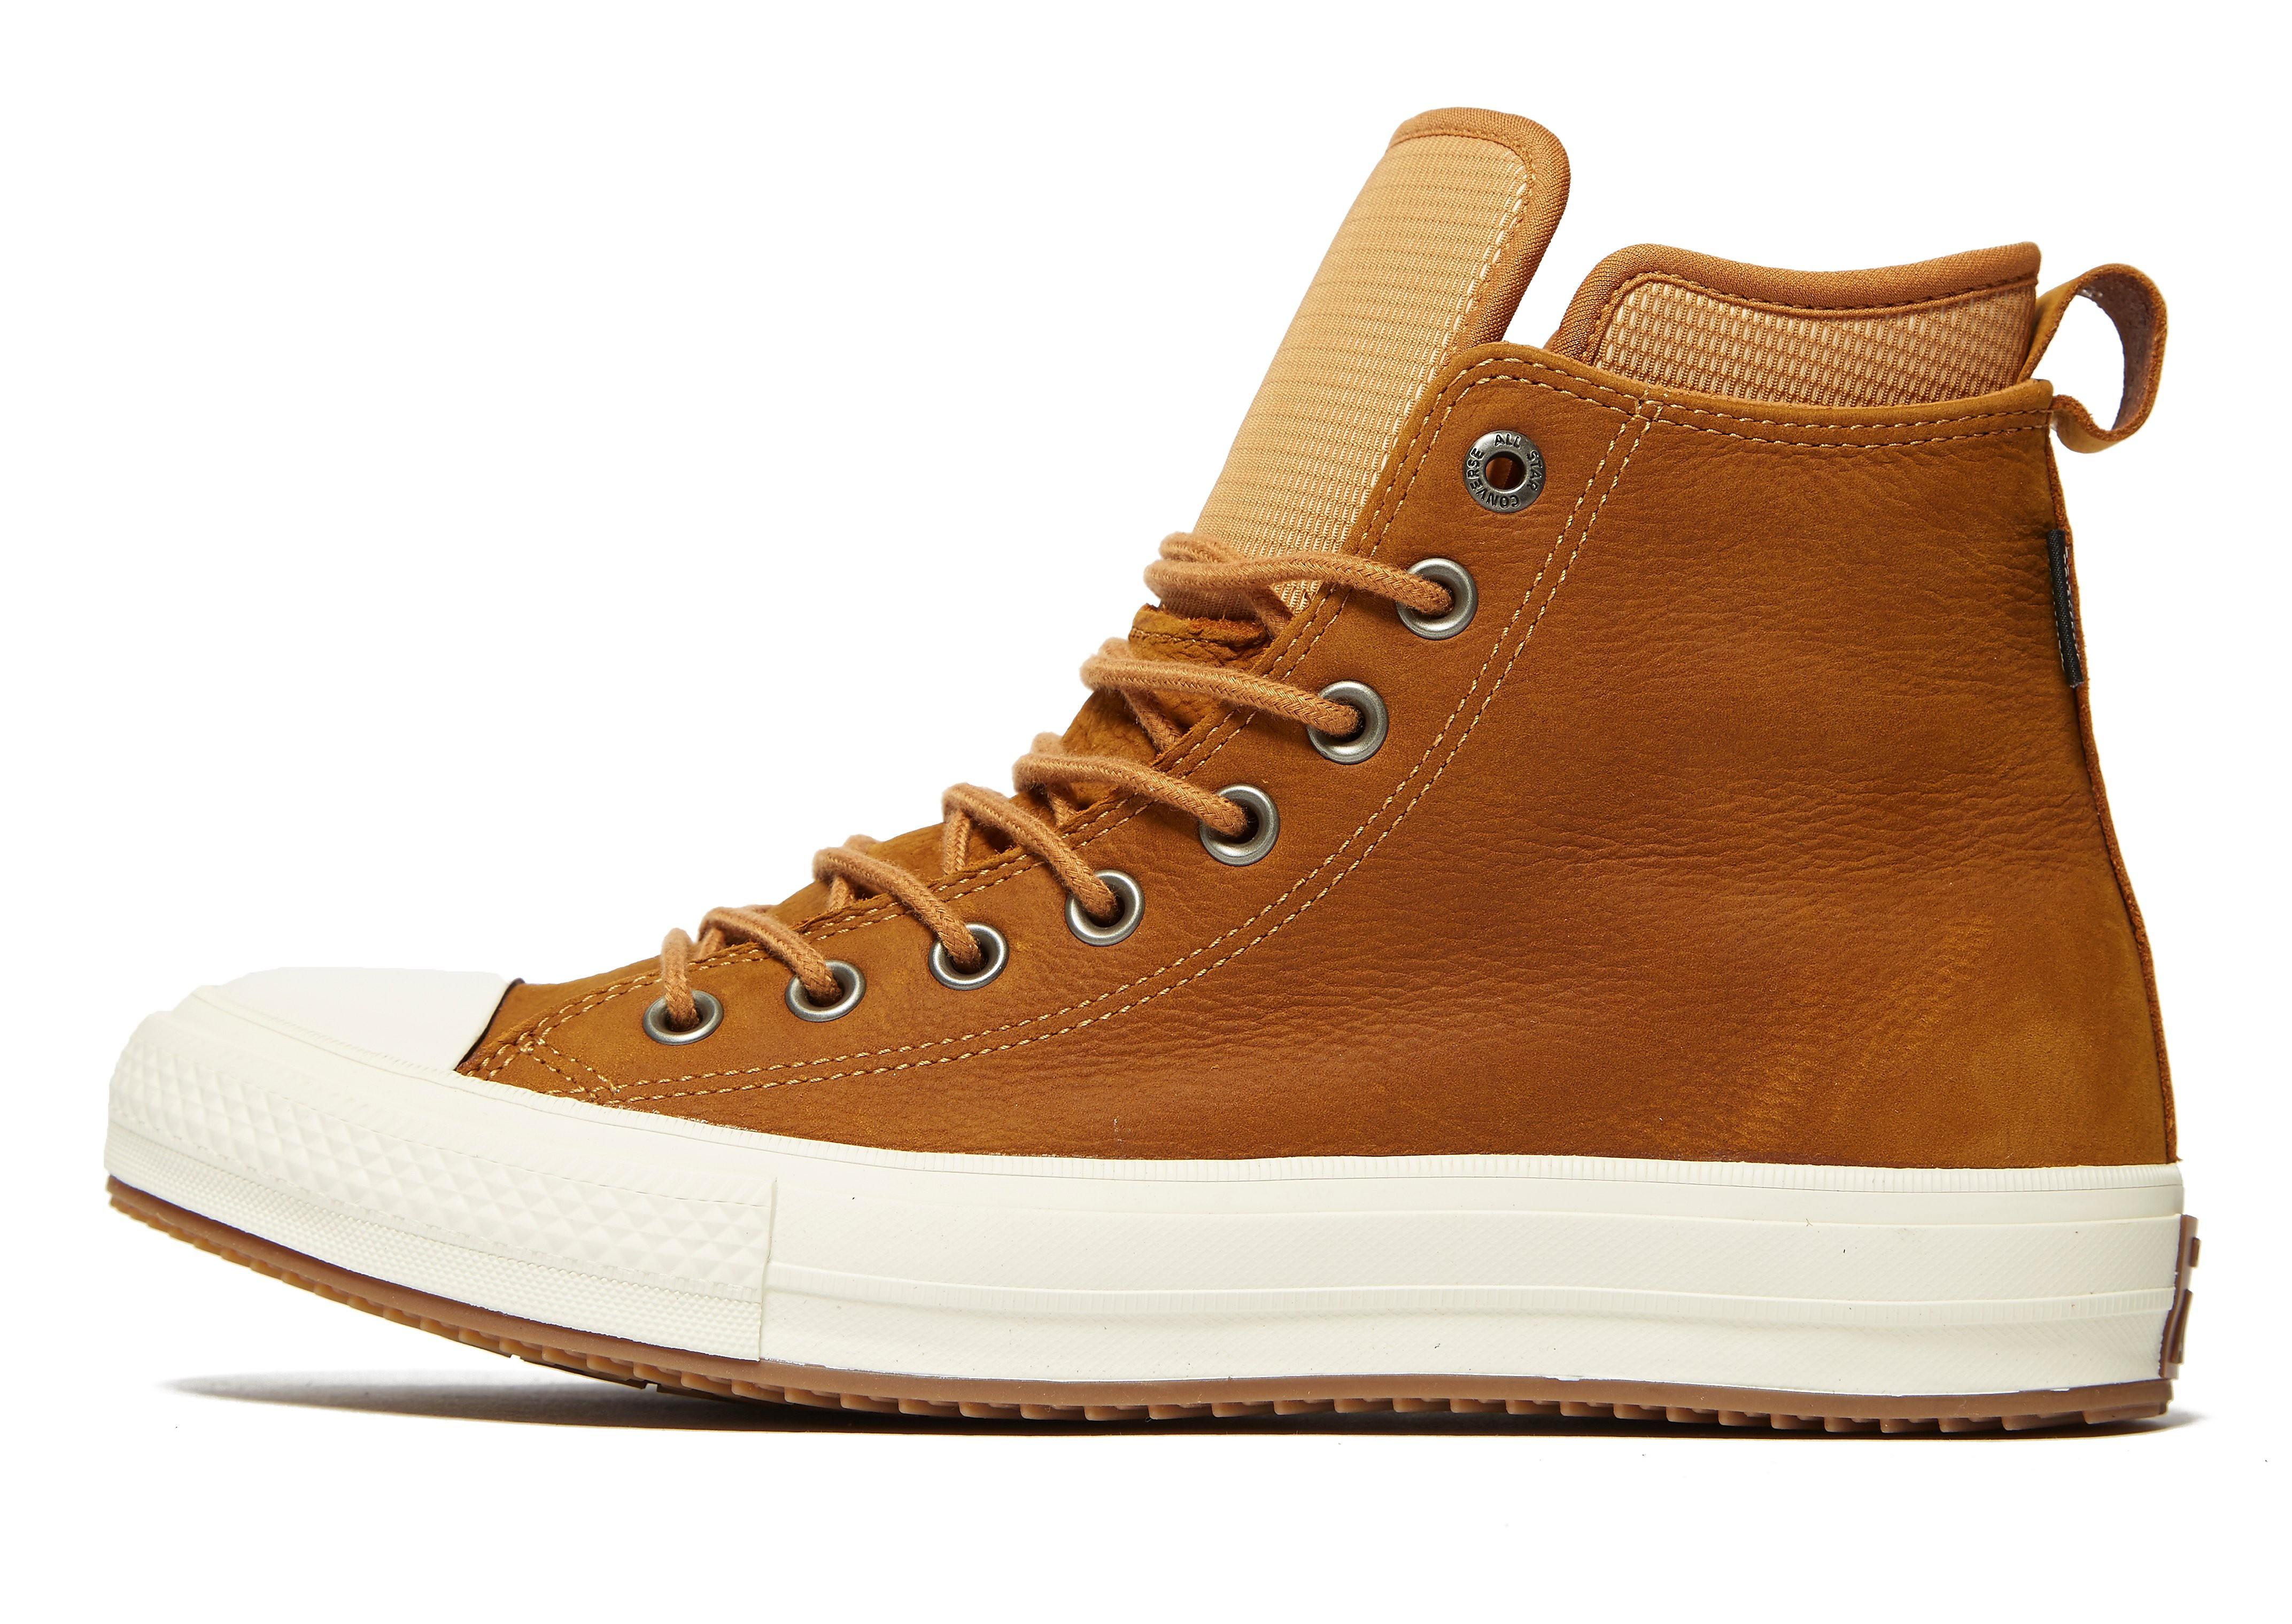 Converse All Star Waterproof Boot High Top